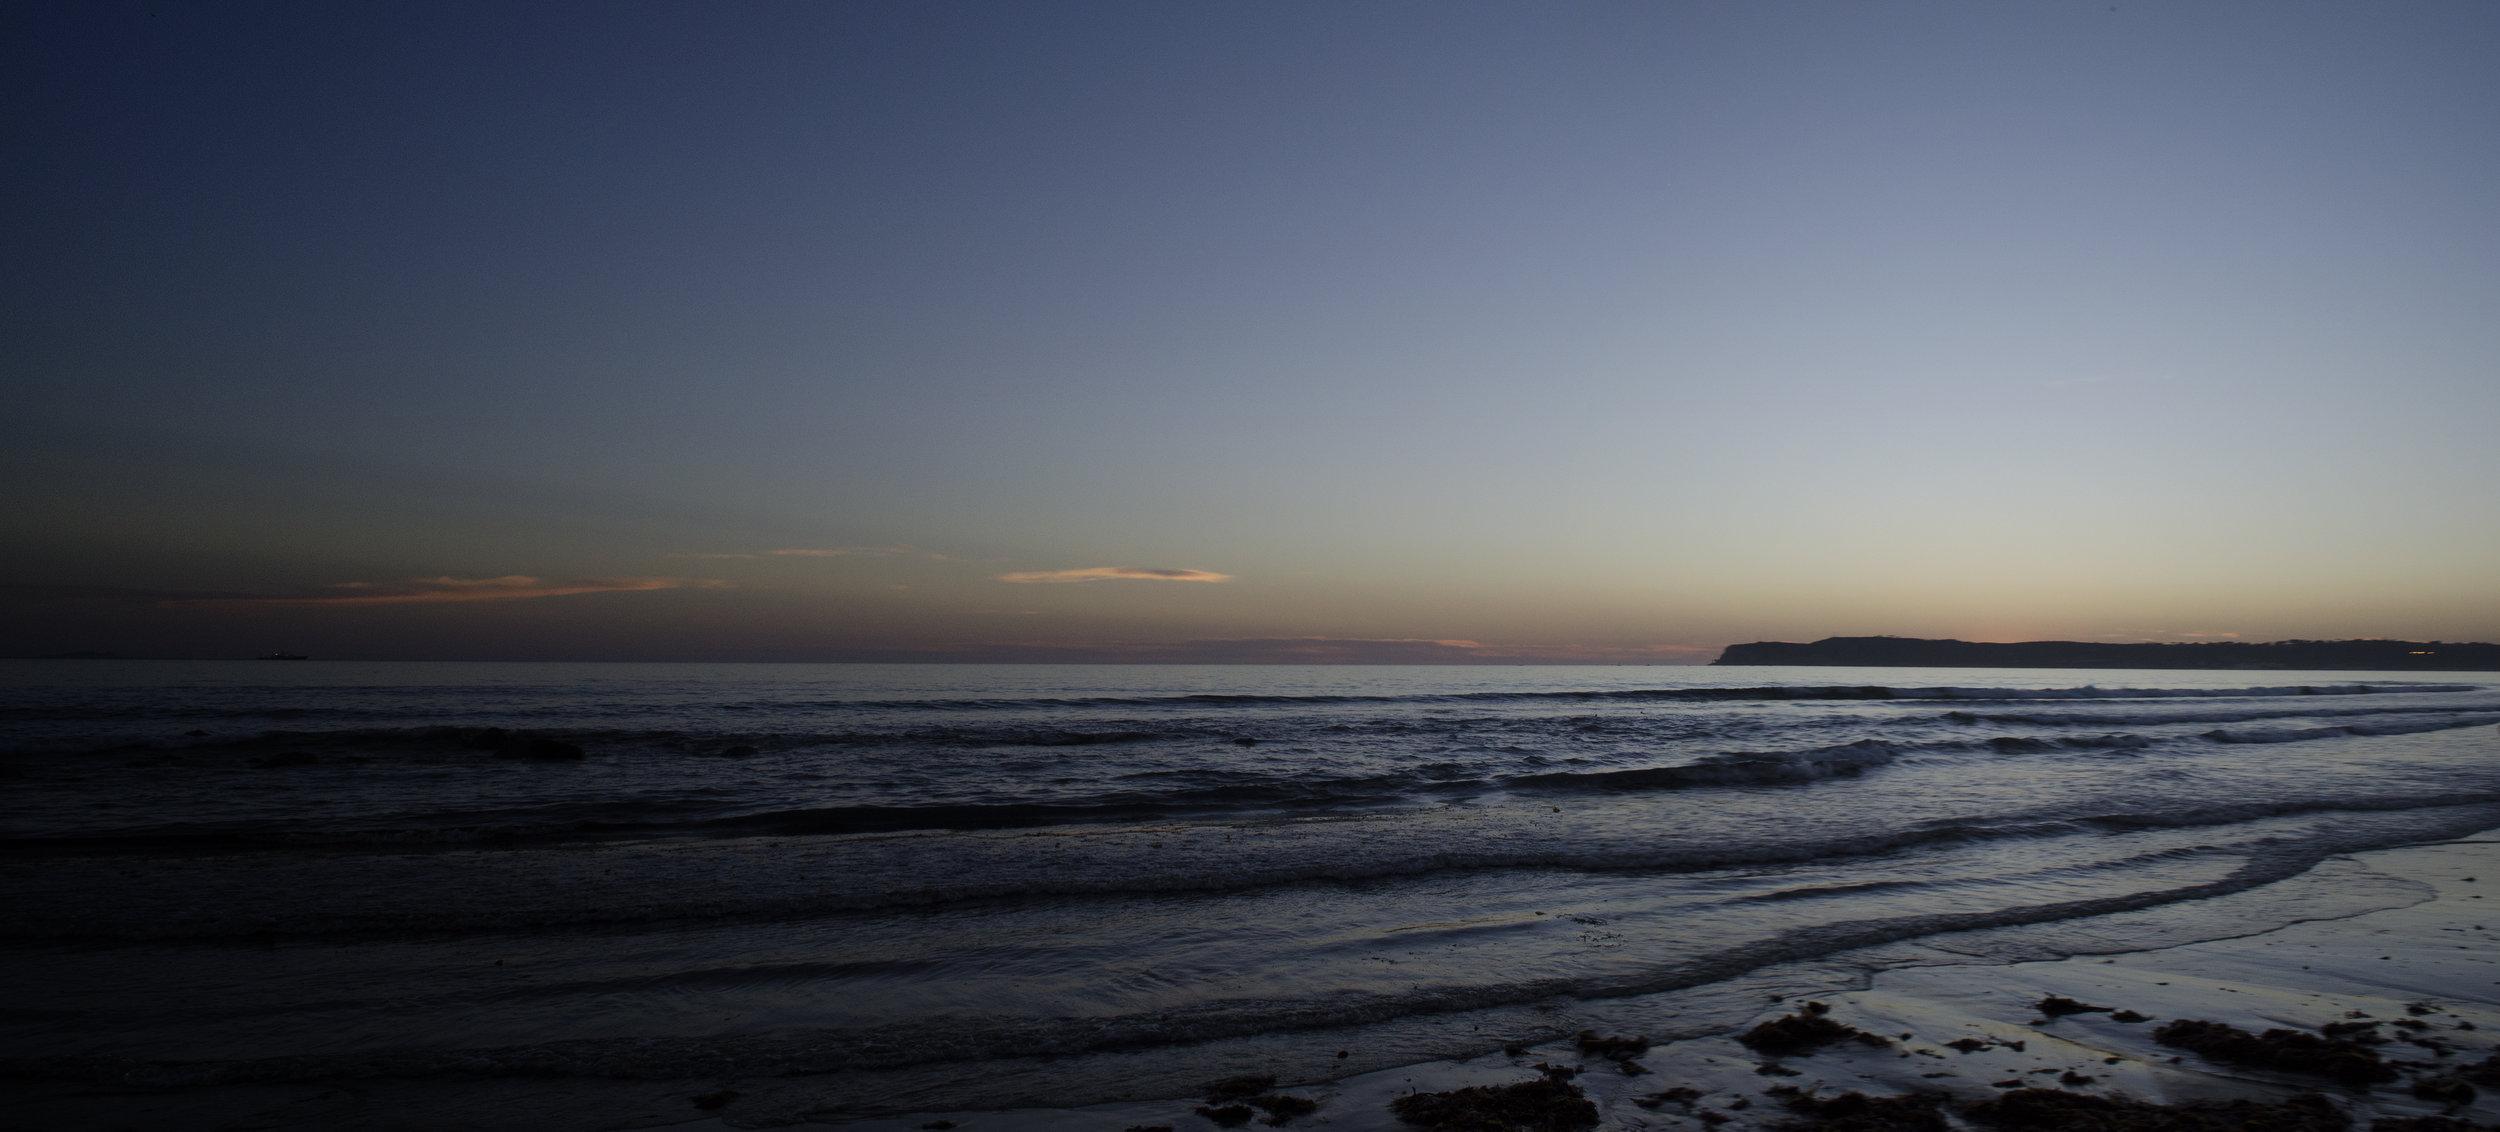 panoramic-sunset-2_16253613684_o.jpg